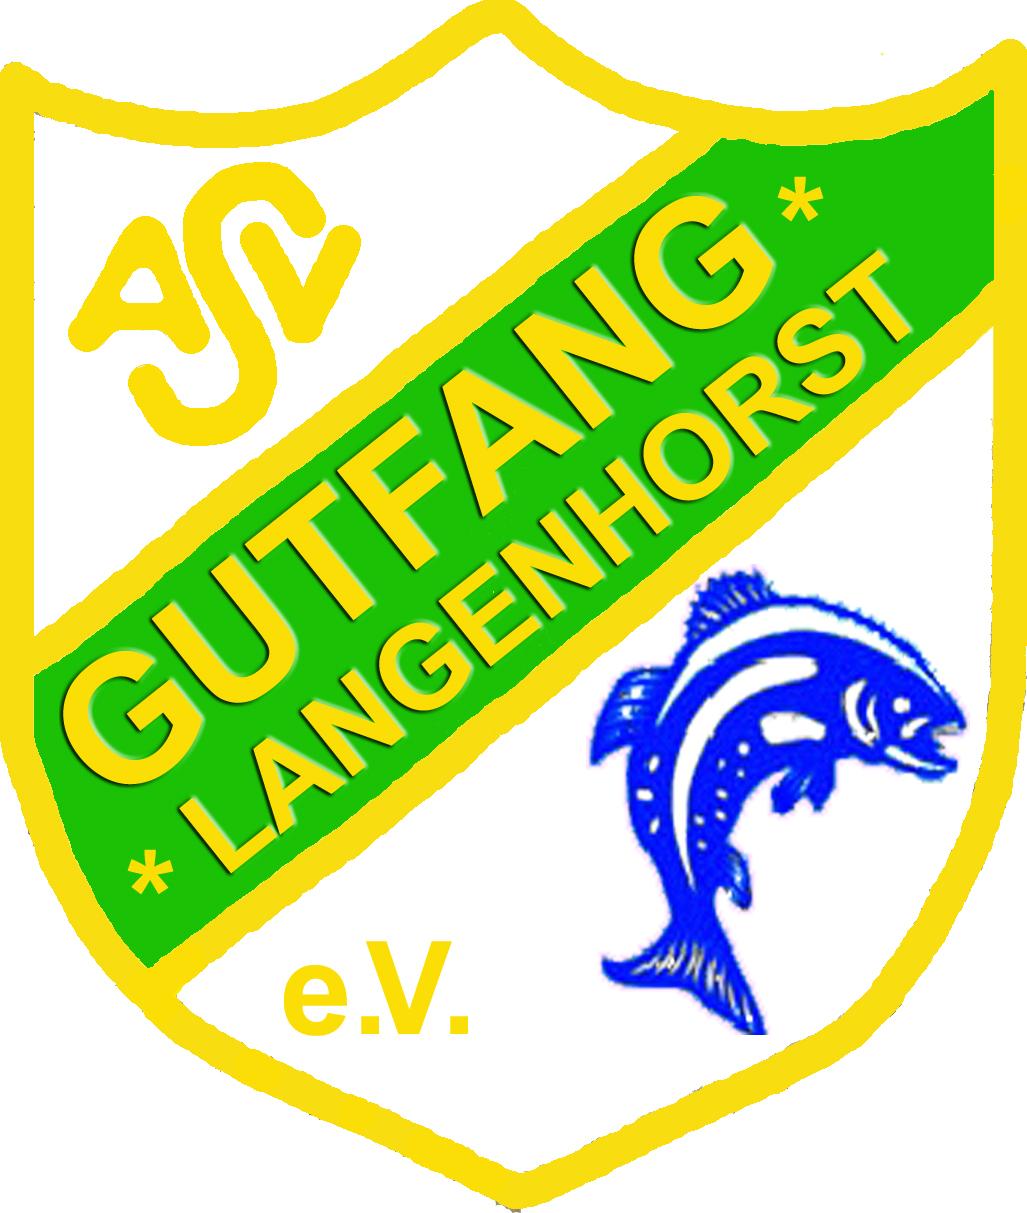 ASV Gutfang Langenhorst e.V.